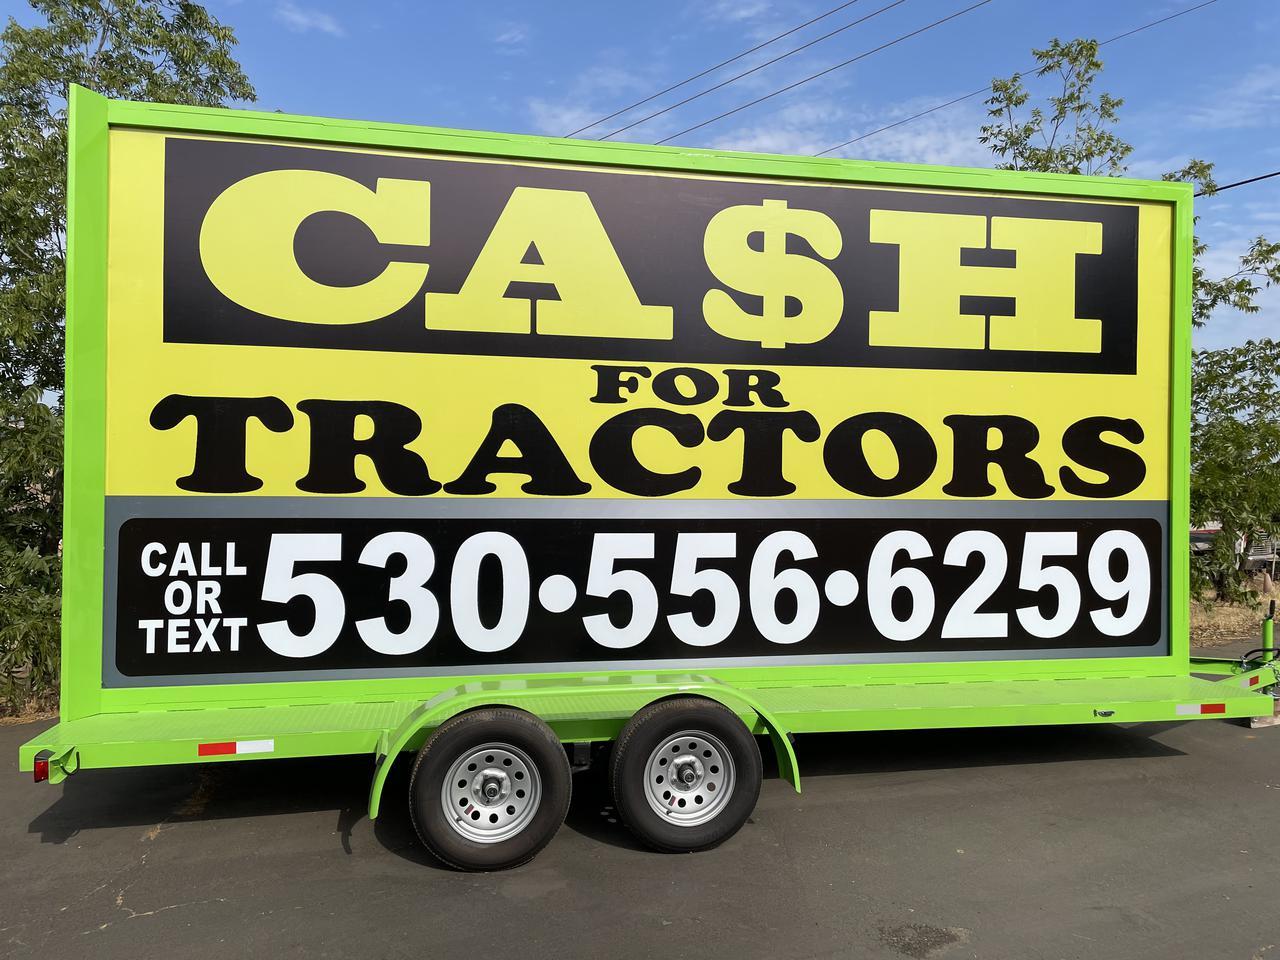 Cash for tractors trailer signage